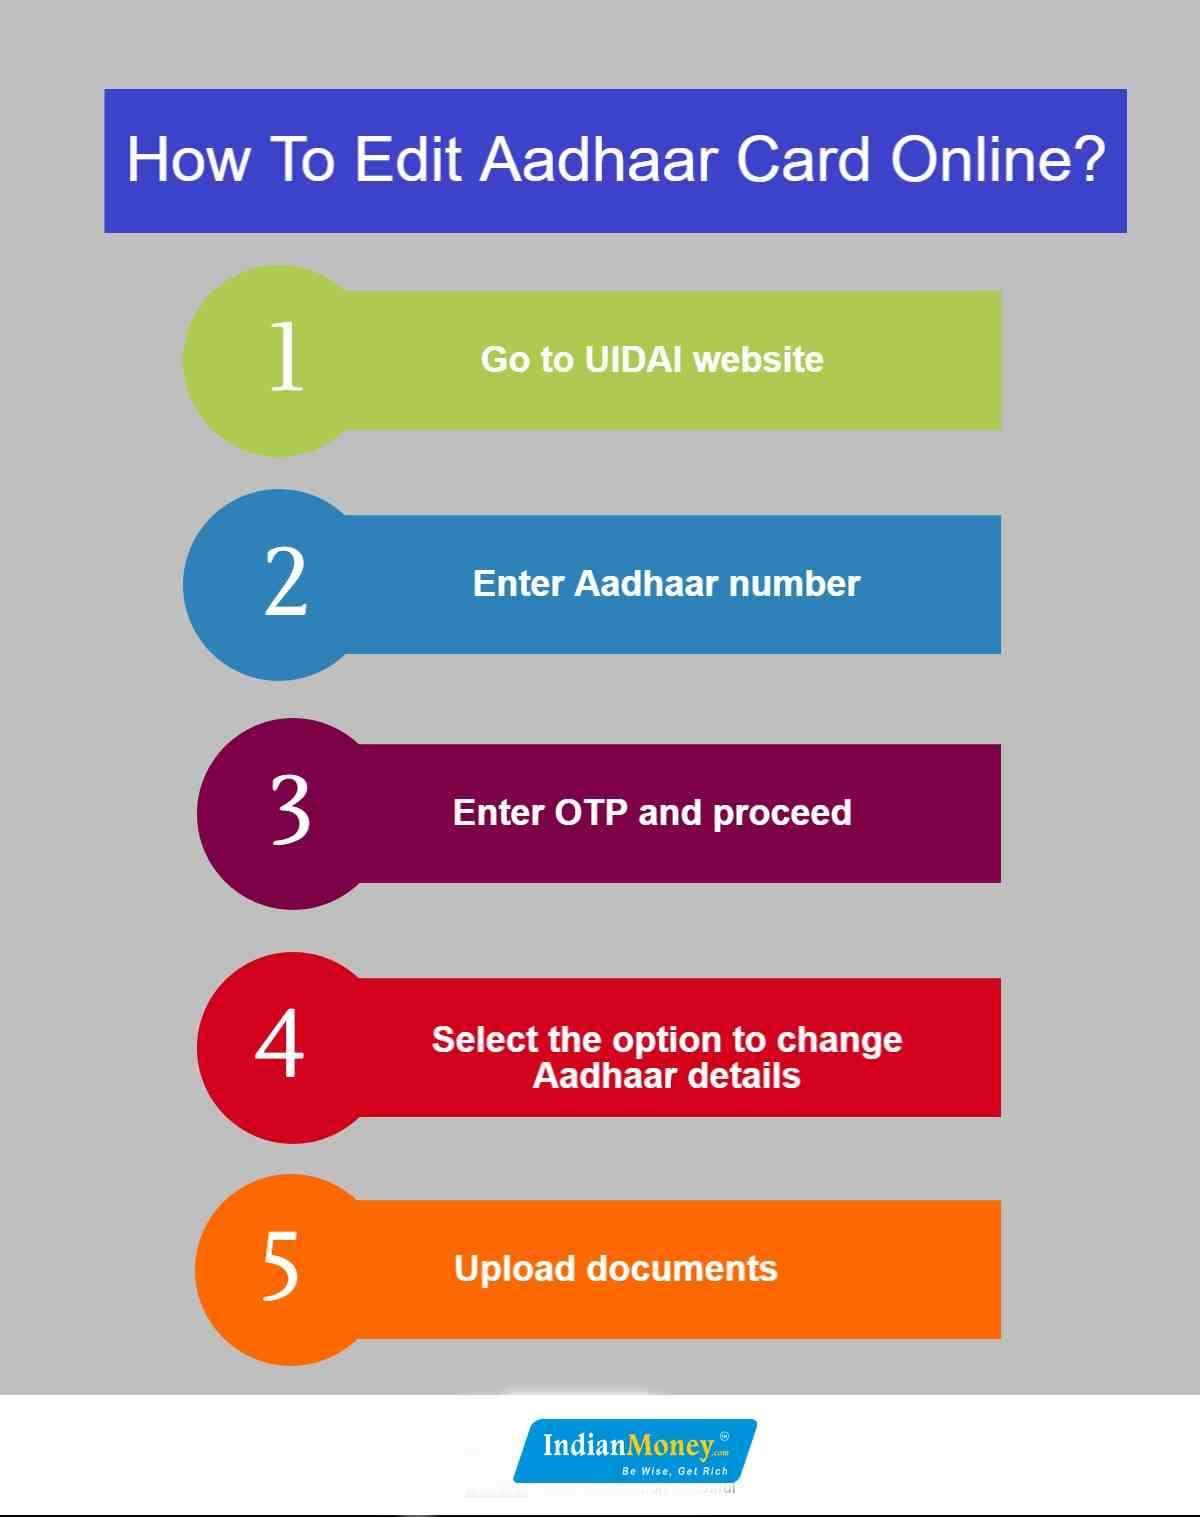 How To Edit Aadhaar Card Online?